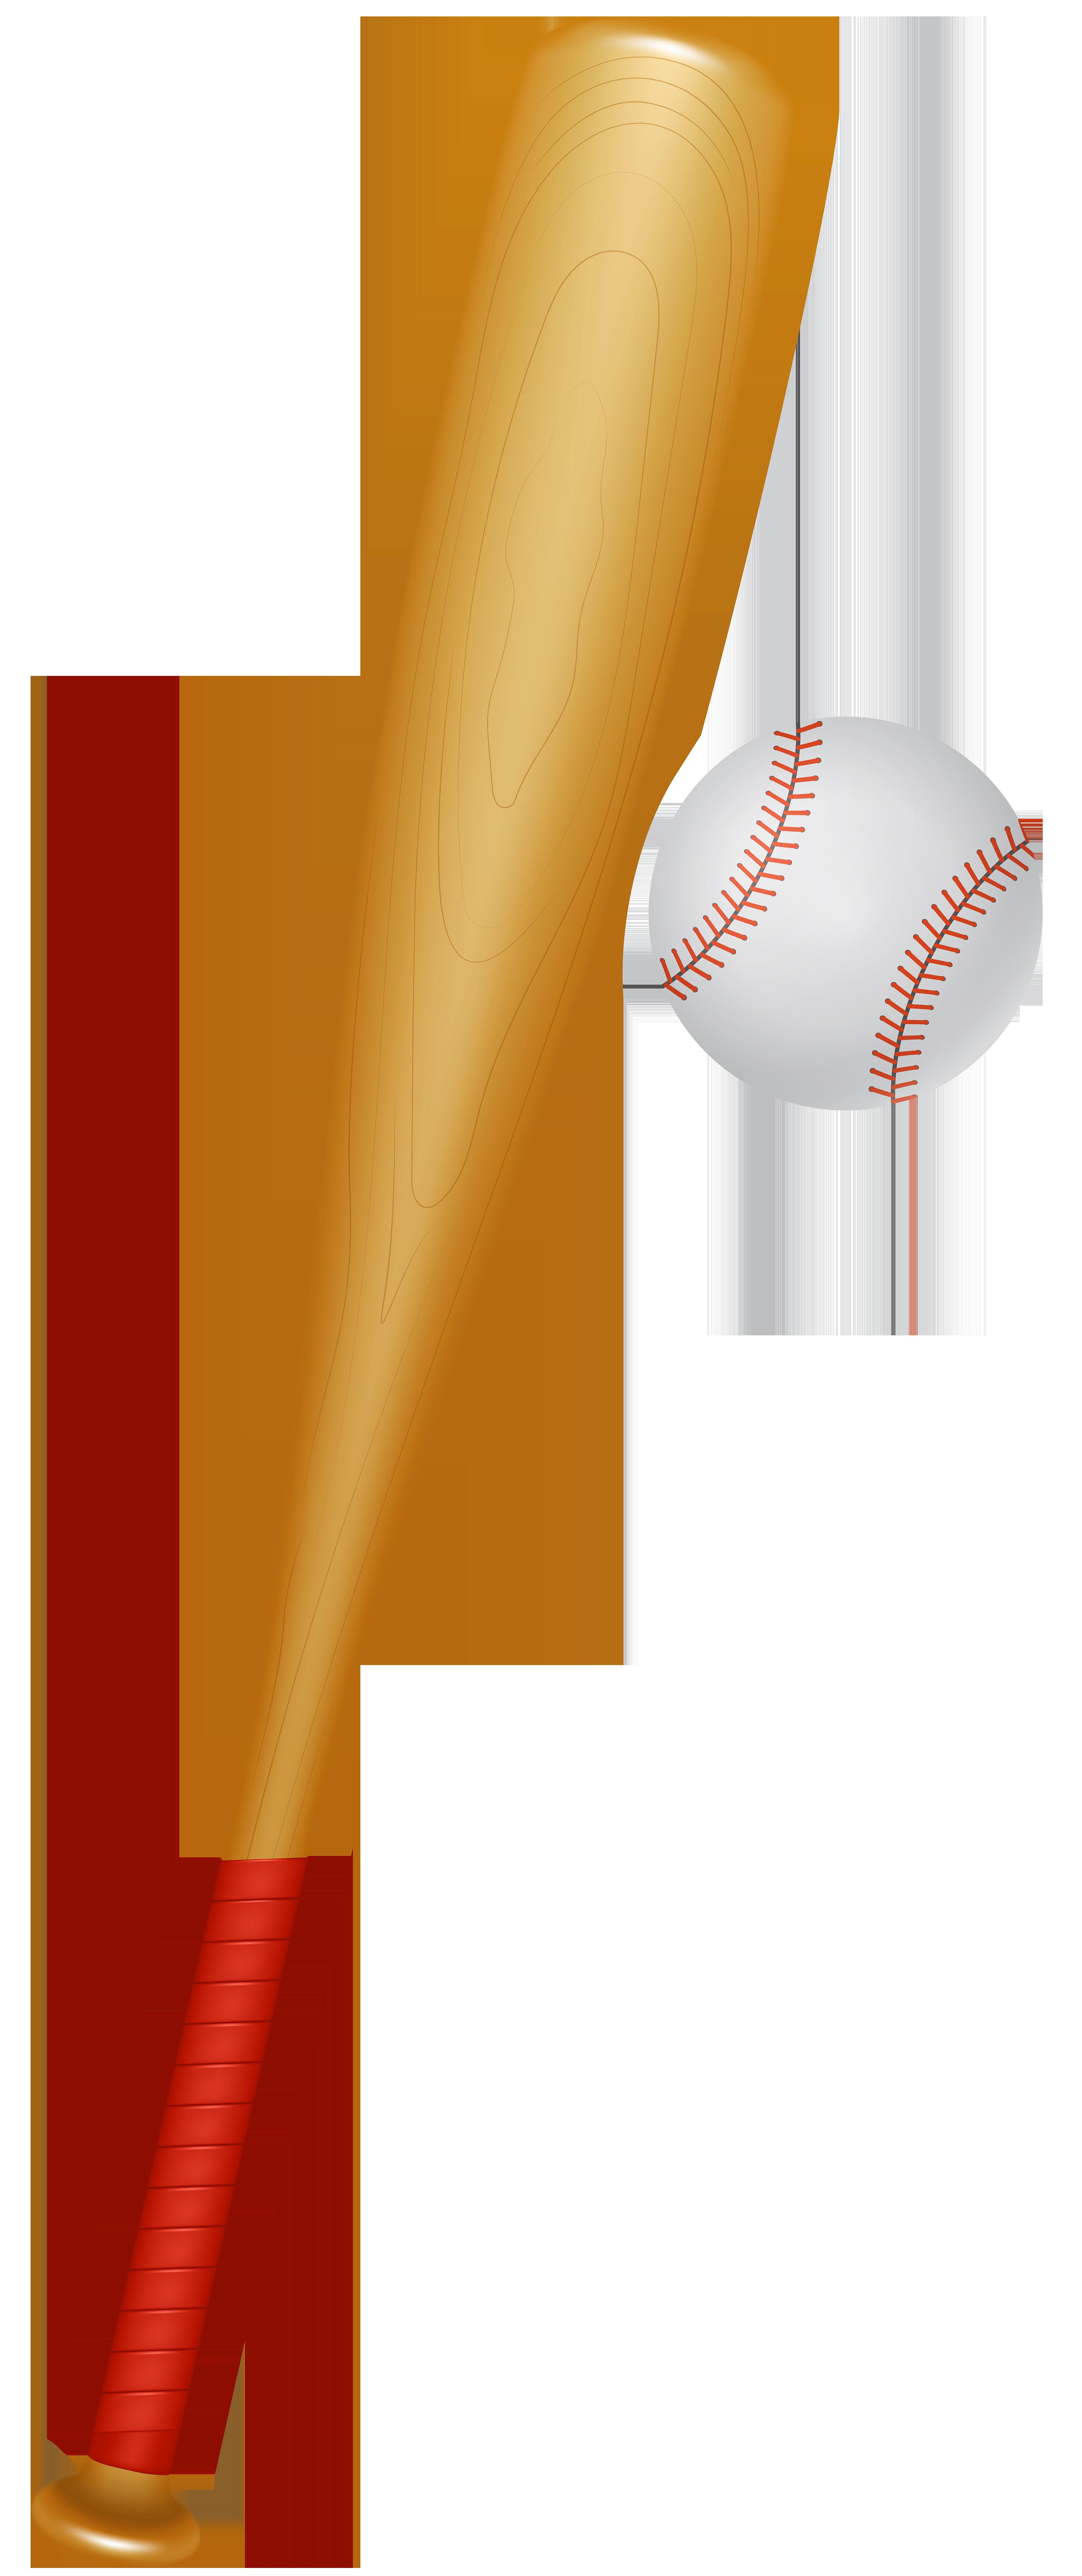 Baseball bat frame transparent clipart png download Baseball Bat PNG Clipart Image | Gallery Yopriceville - High ... png download